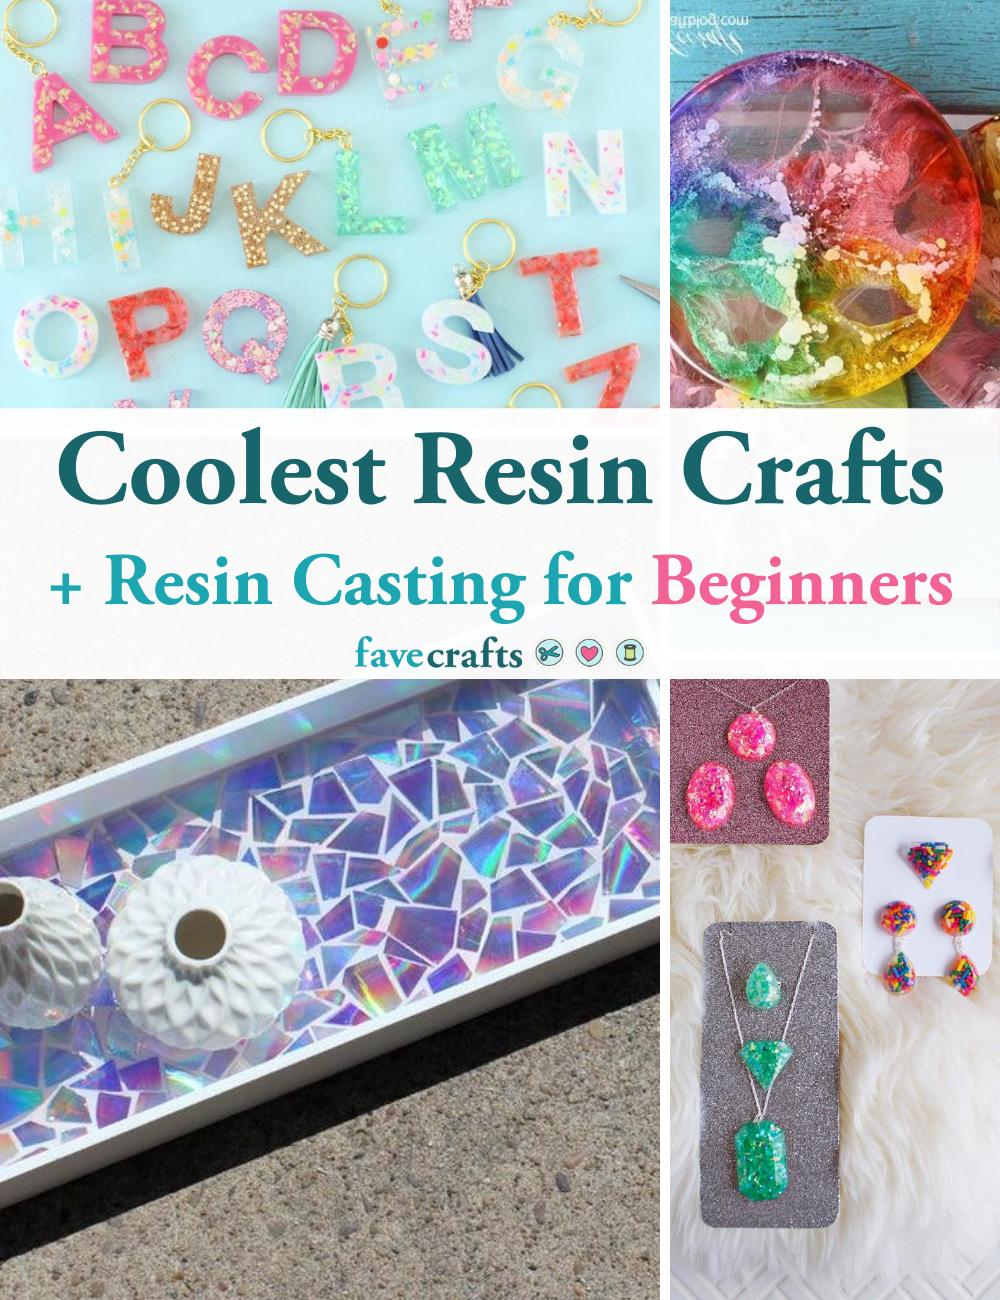 12 Coolest Resin Crafts Resin Casting For Beginners Favecrafts Com